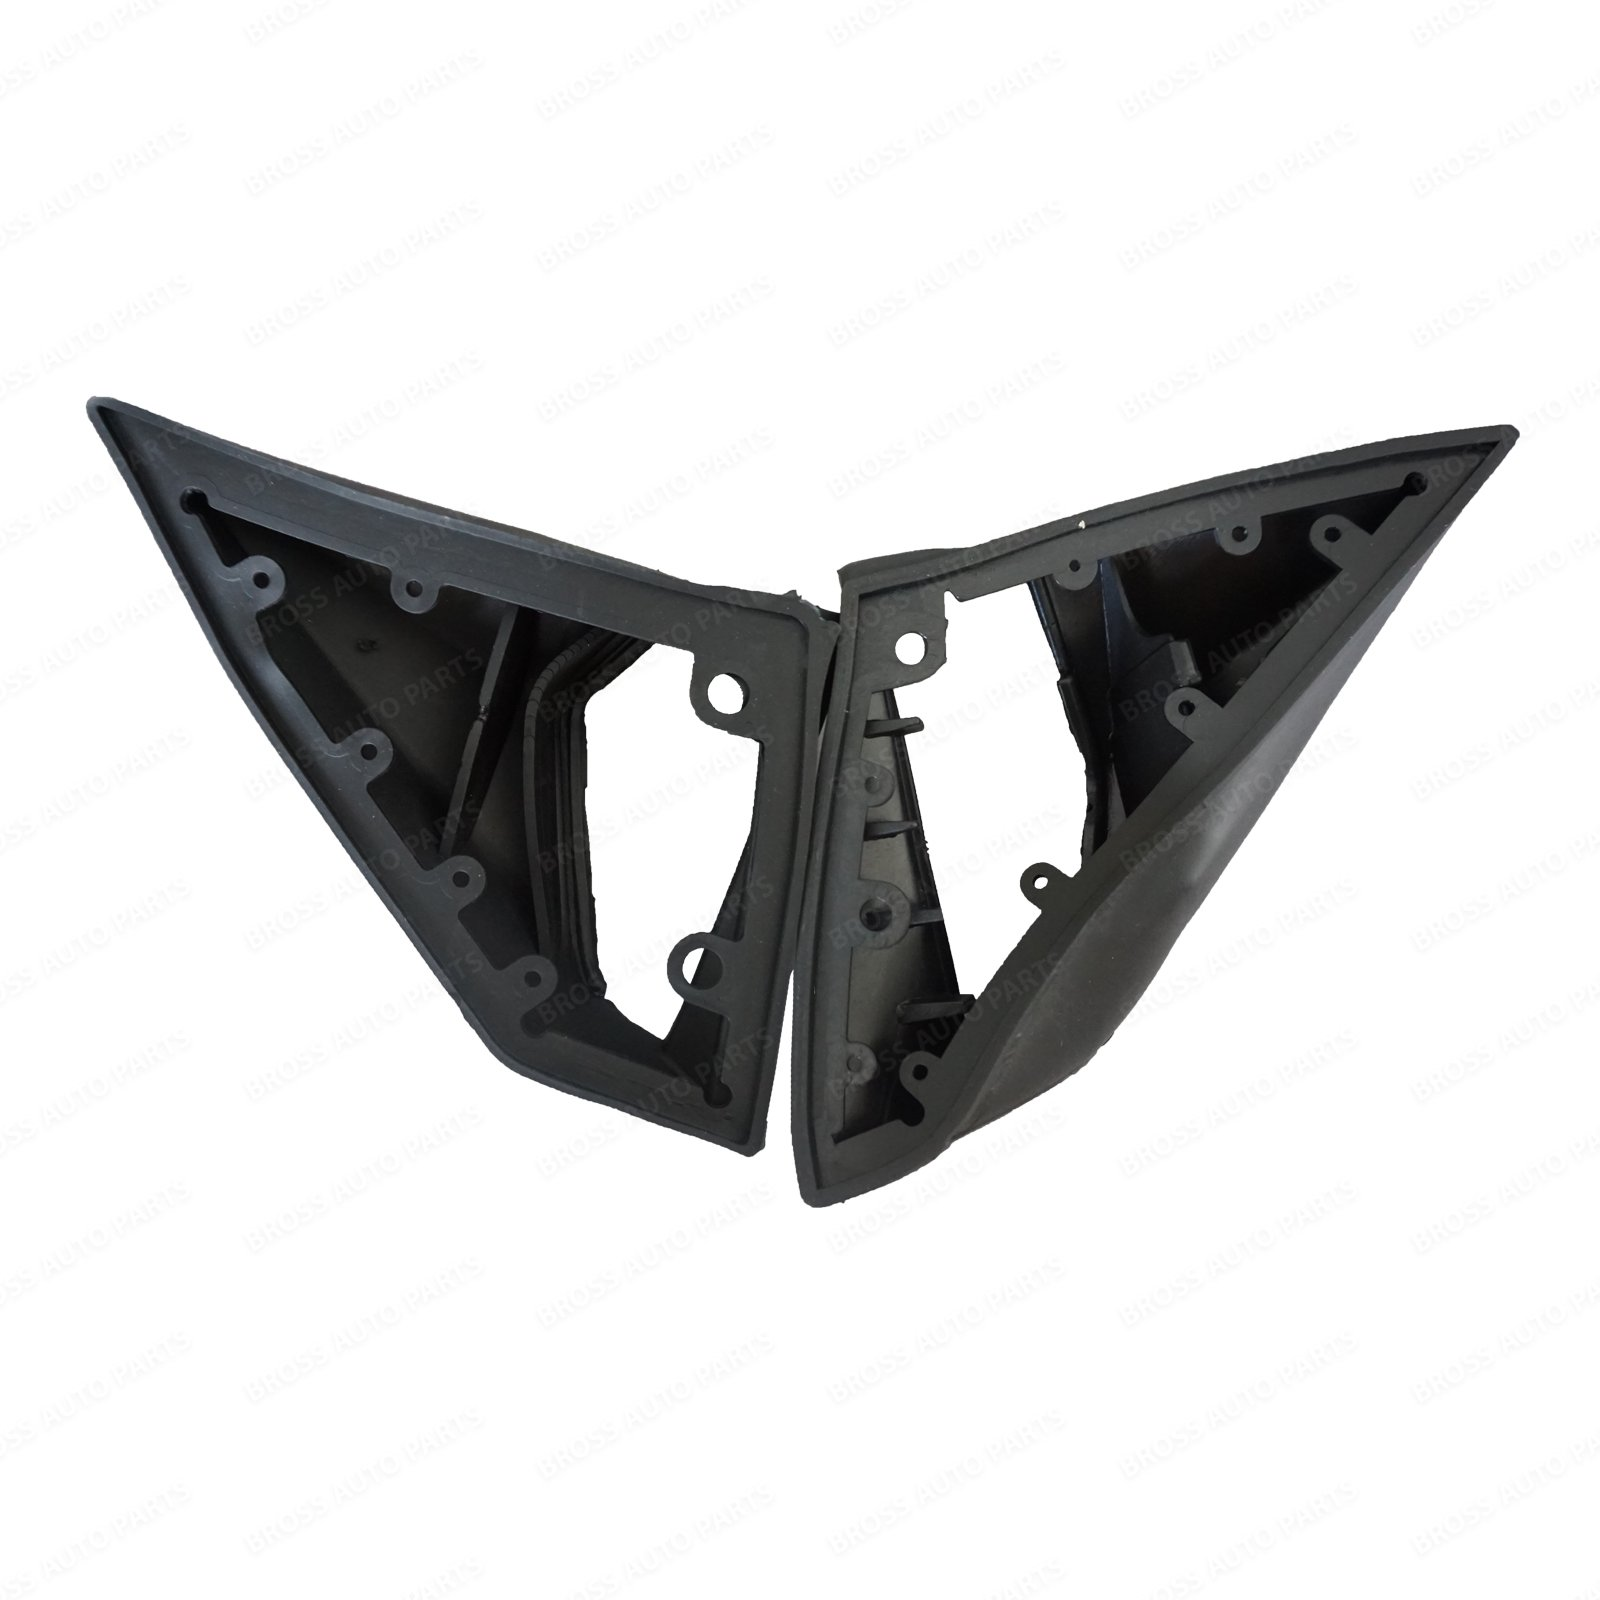 BSP846 Exterior Mirror Rubber Seals L+R Pads LHD A1248107716 LHD for Mercedes Benz W201 W124